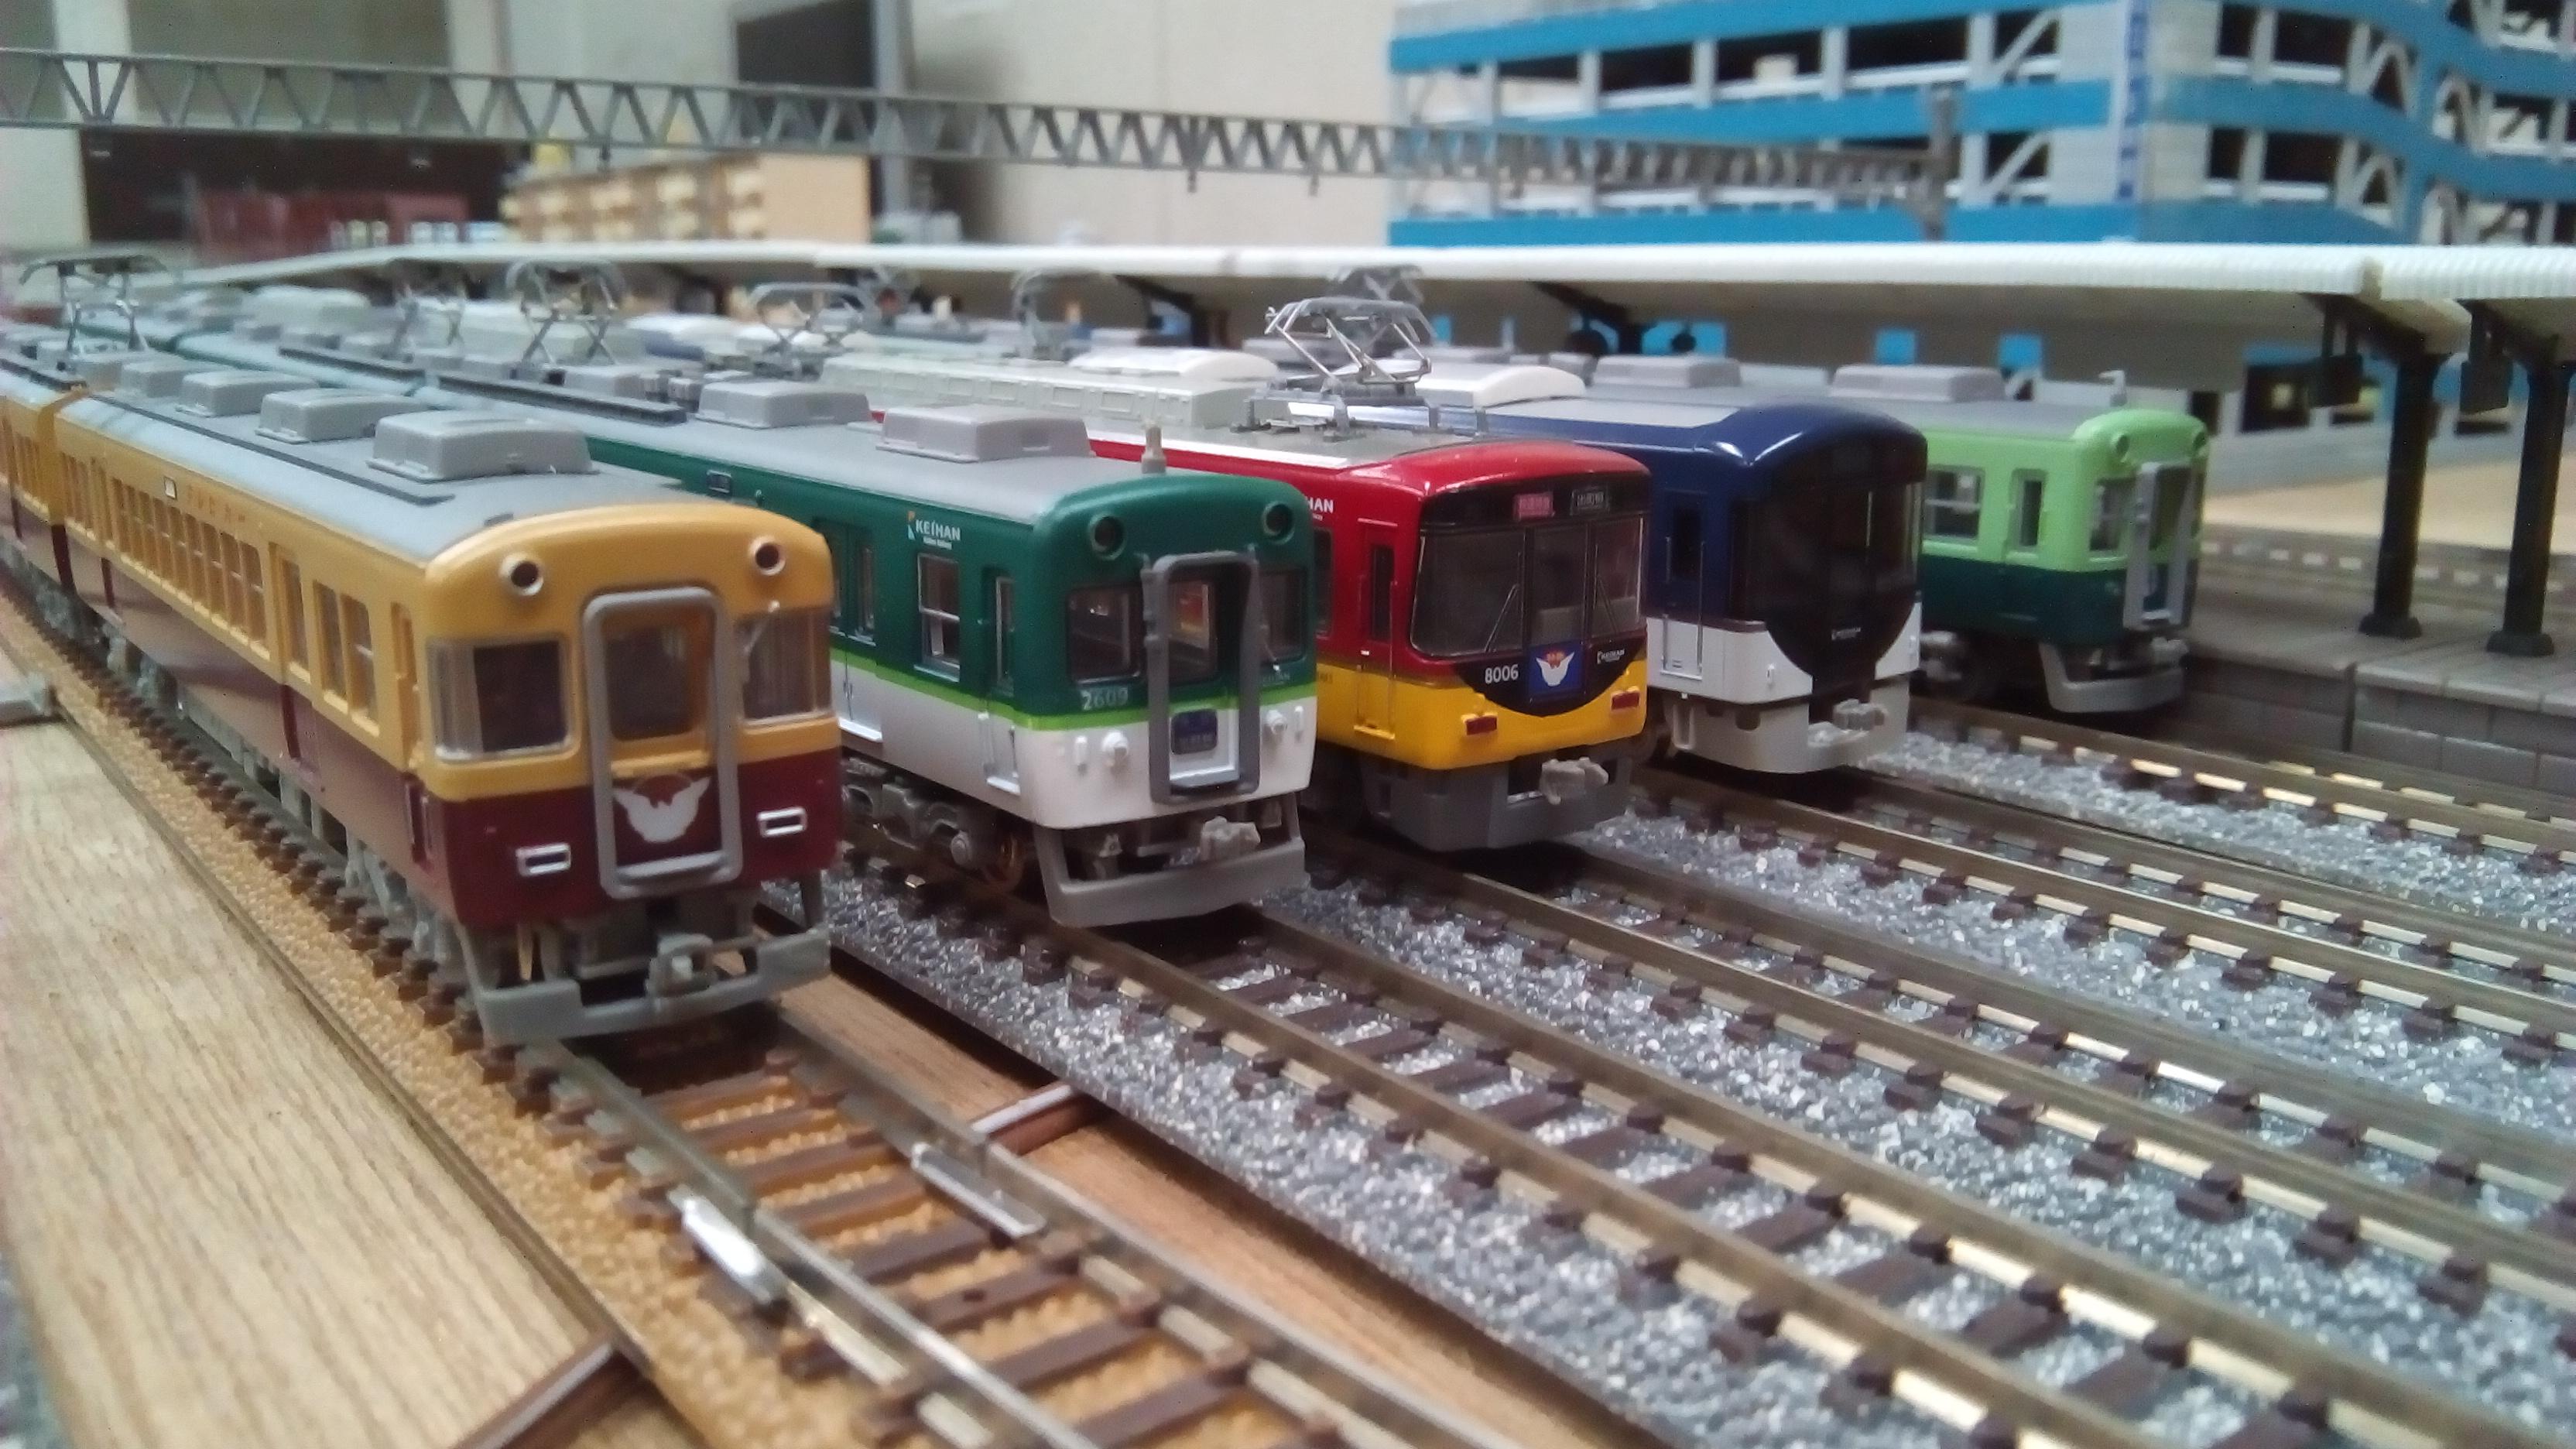 Keihan Railways